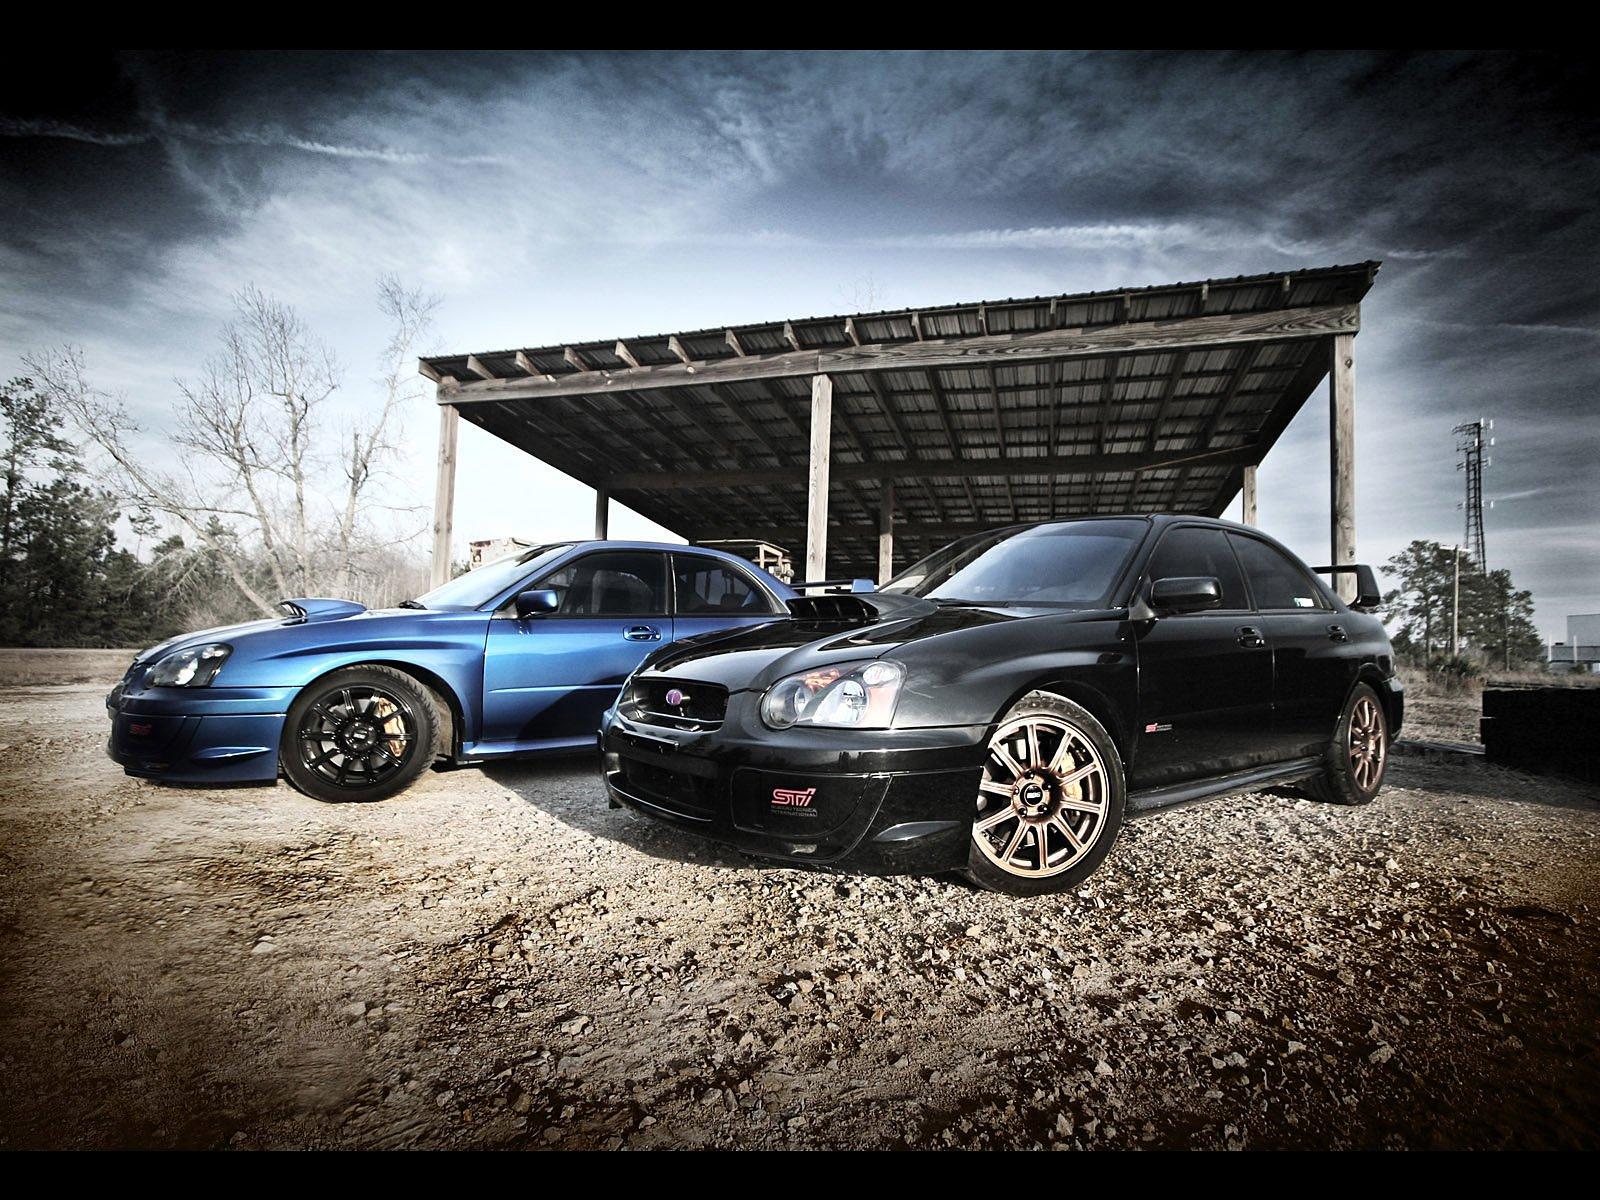 Vehicles - Subaru Impreza  Wallpaper